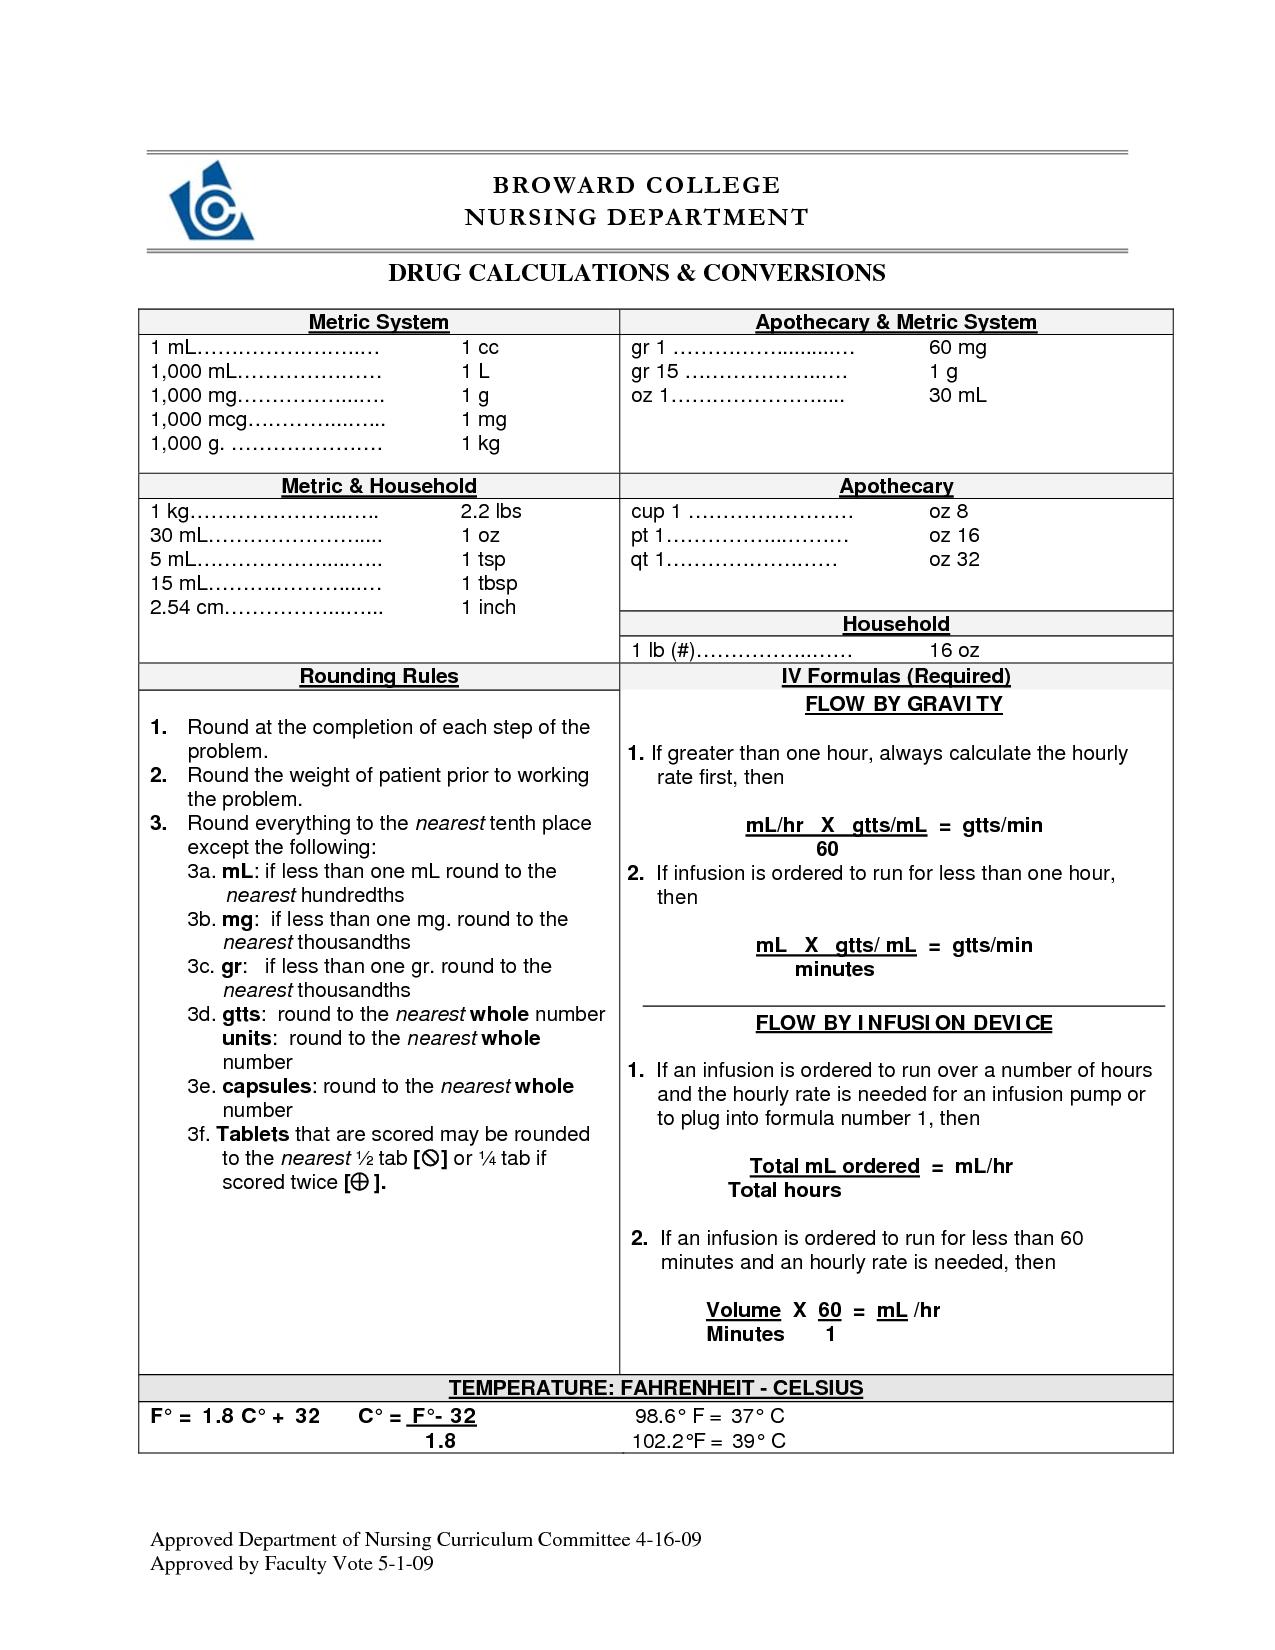 Worksheets Nursing Math Worksheets nursing formulas broward college department pharm nurse education nursing